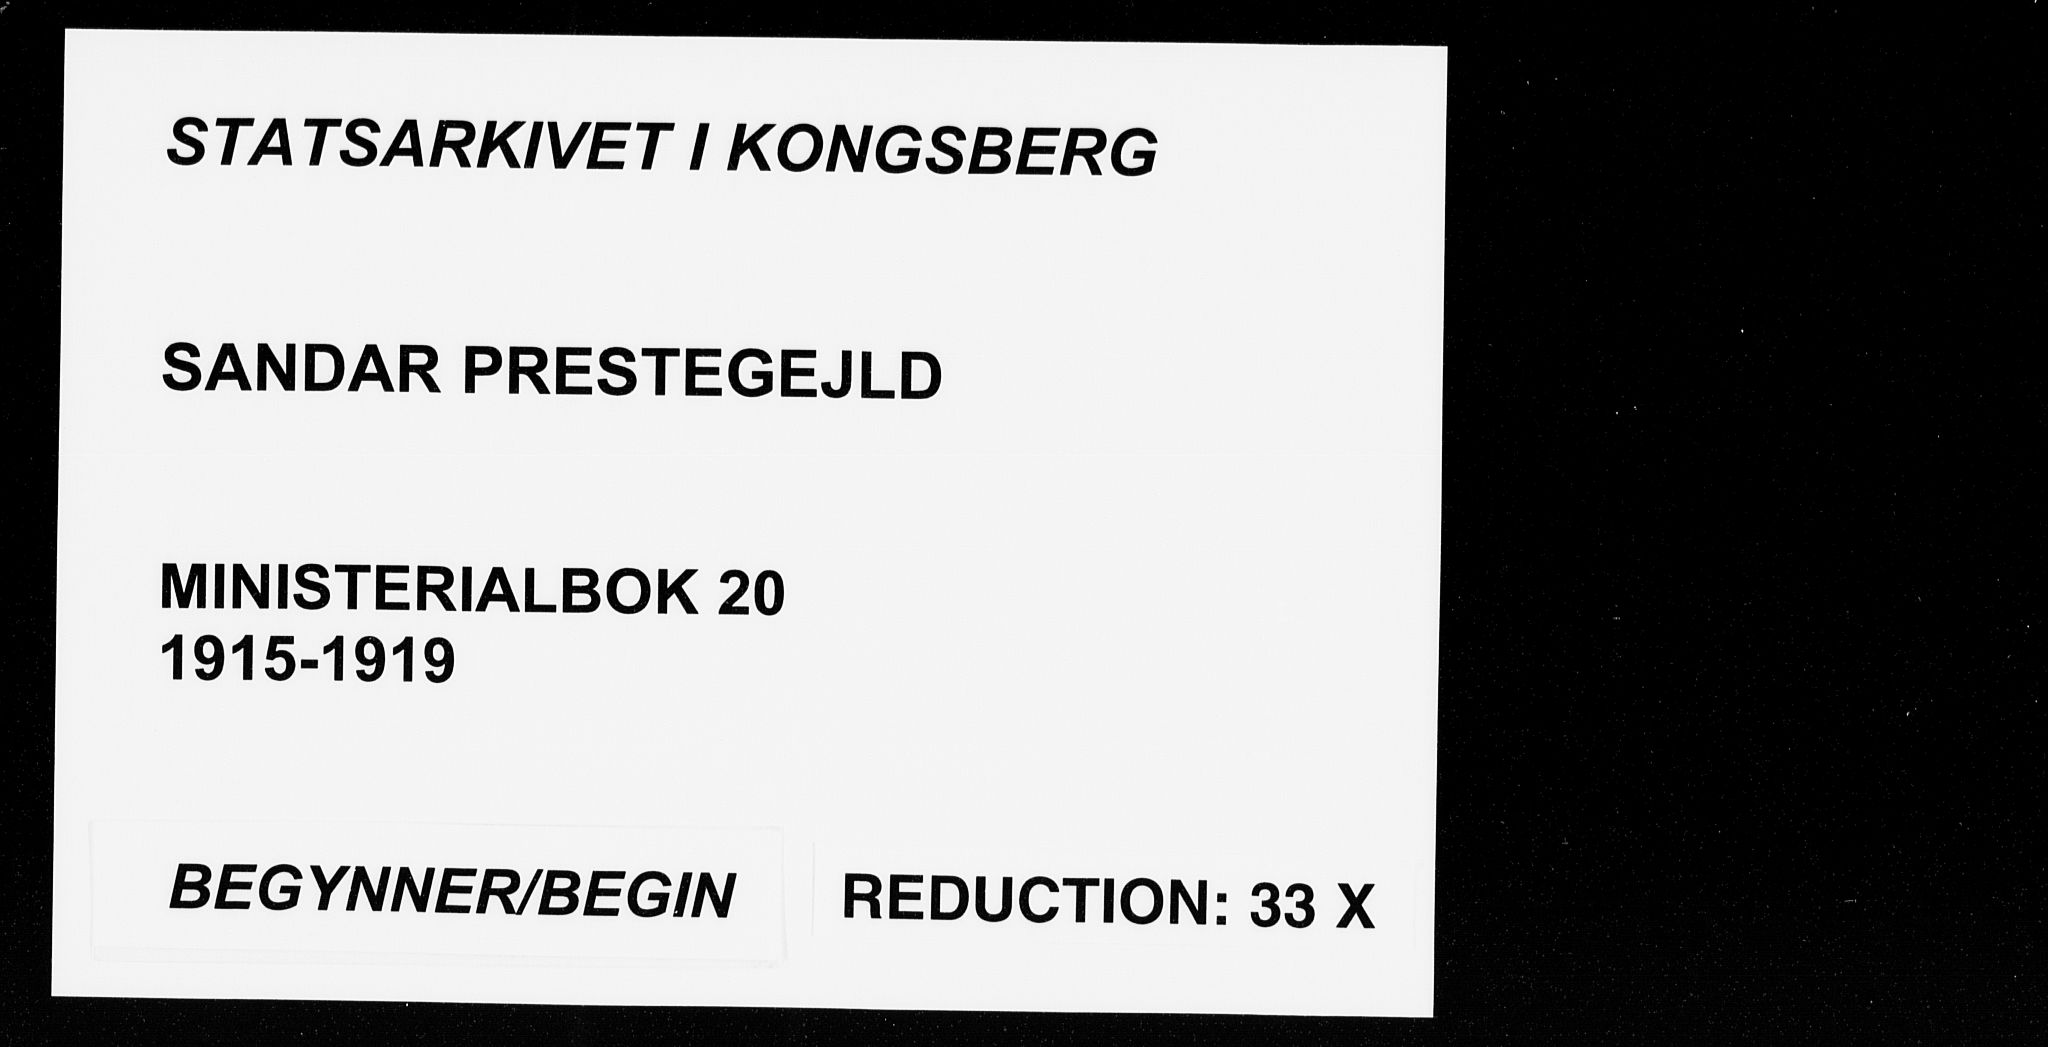 SAKO, Sandar kirkebøker, F/Fa/L0020: Ministerialbok nr. 20, 1915-1919